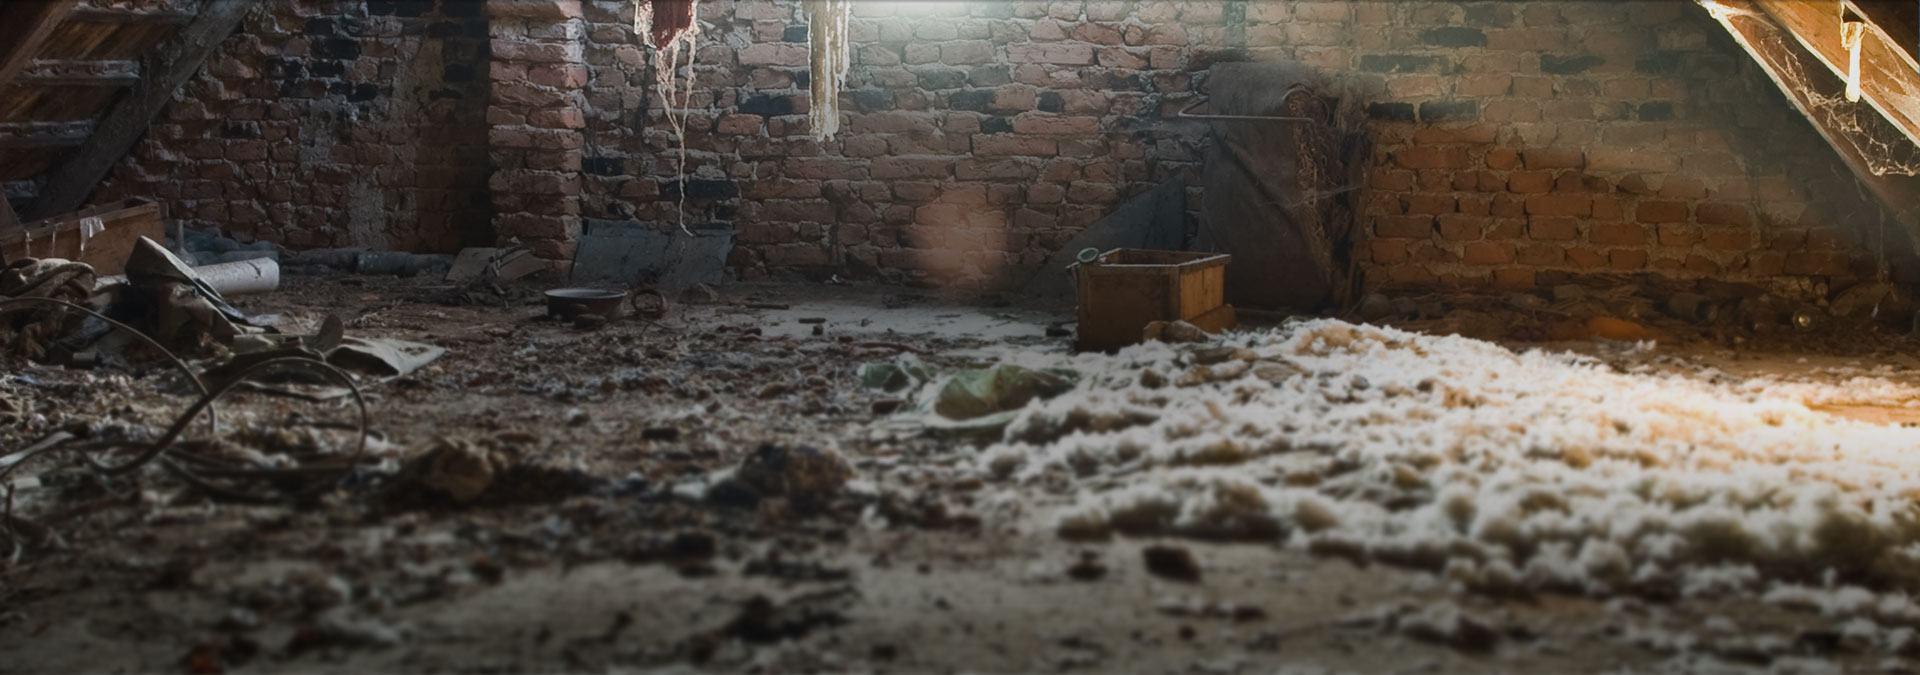 asbestos removal brisbane northside - Excel Asbestos Removal QLD